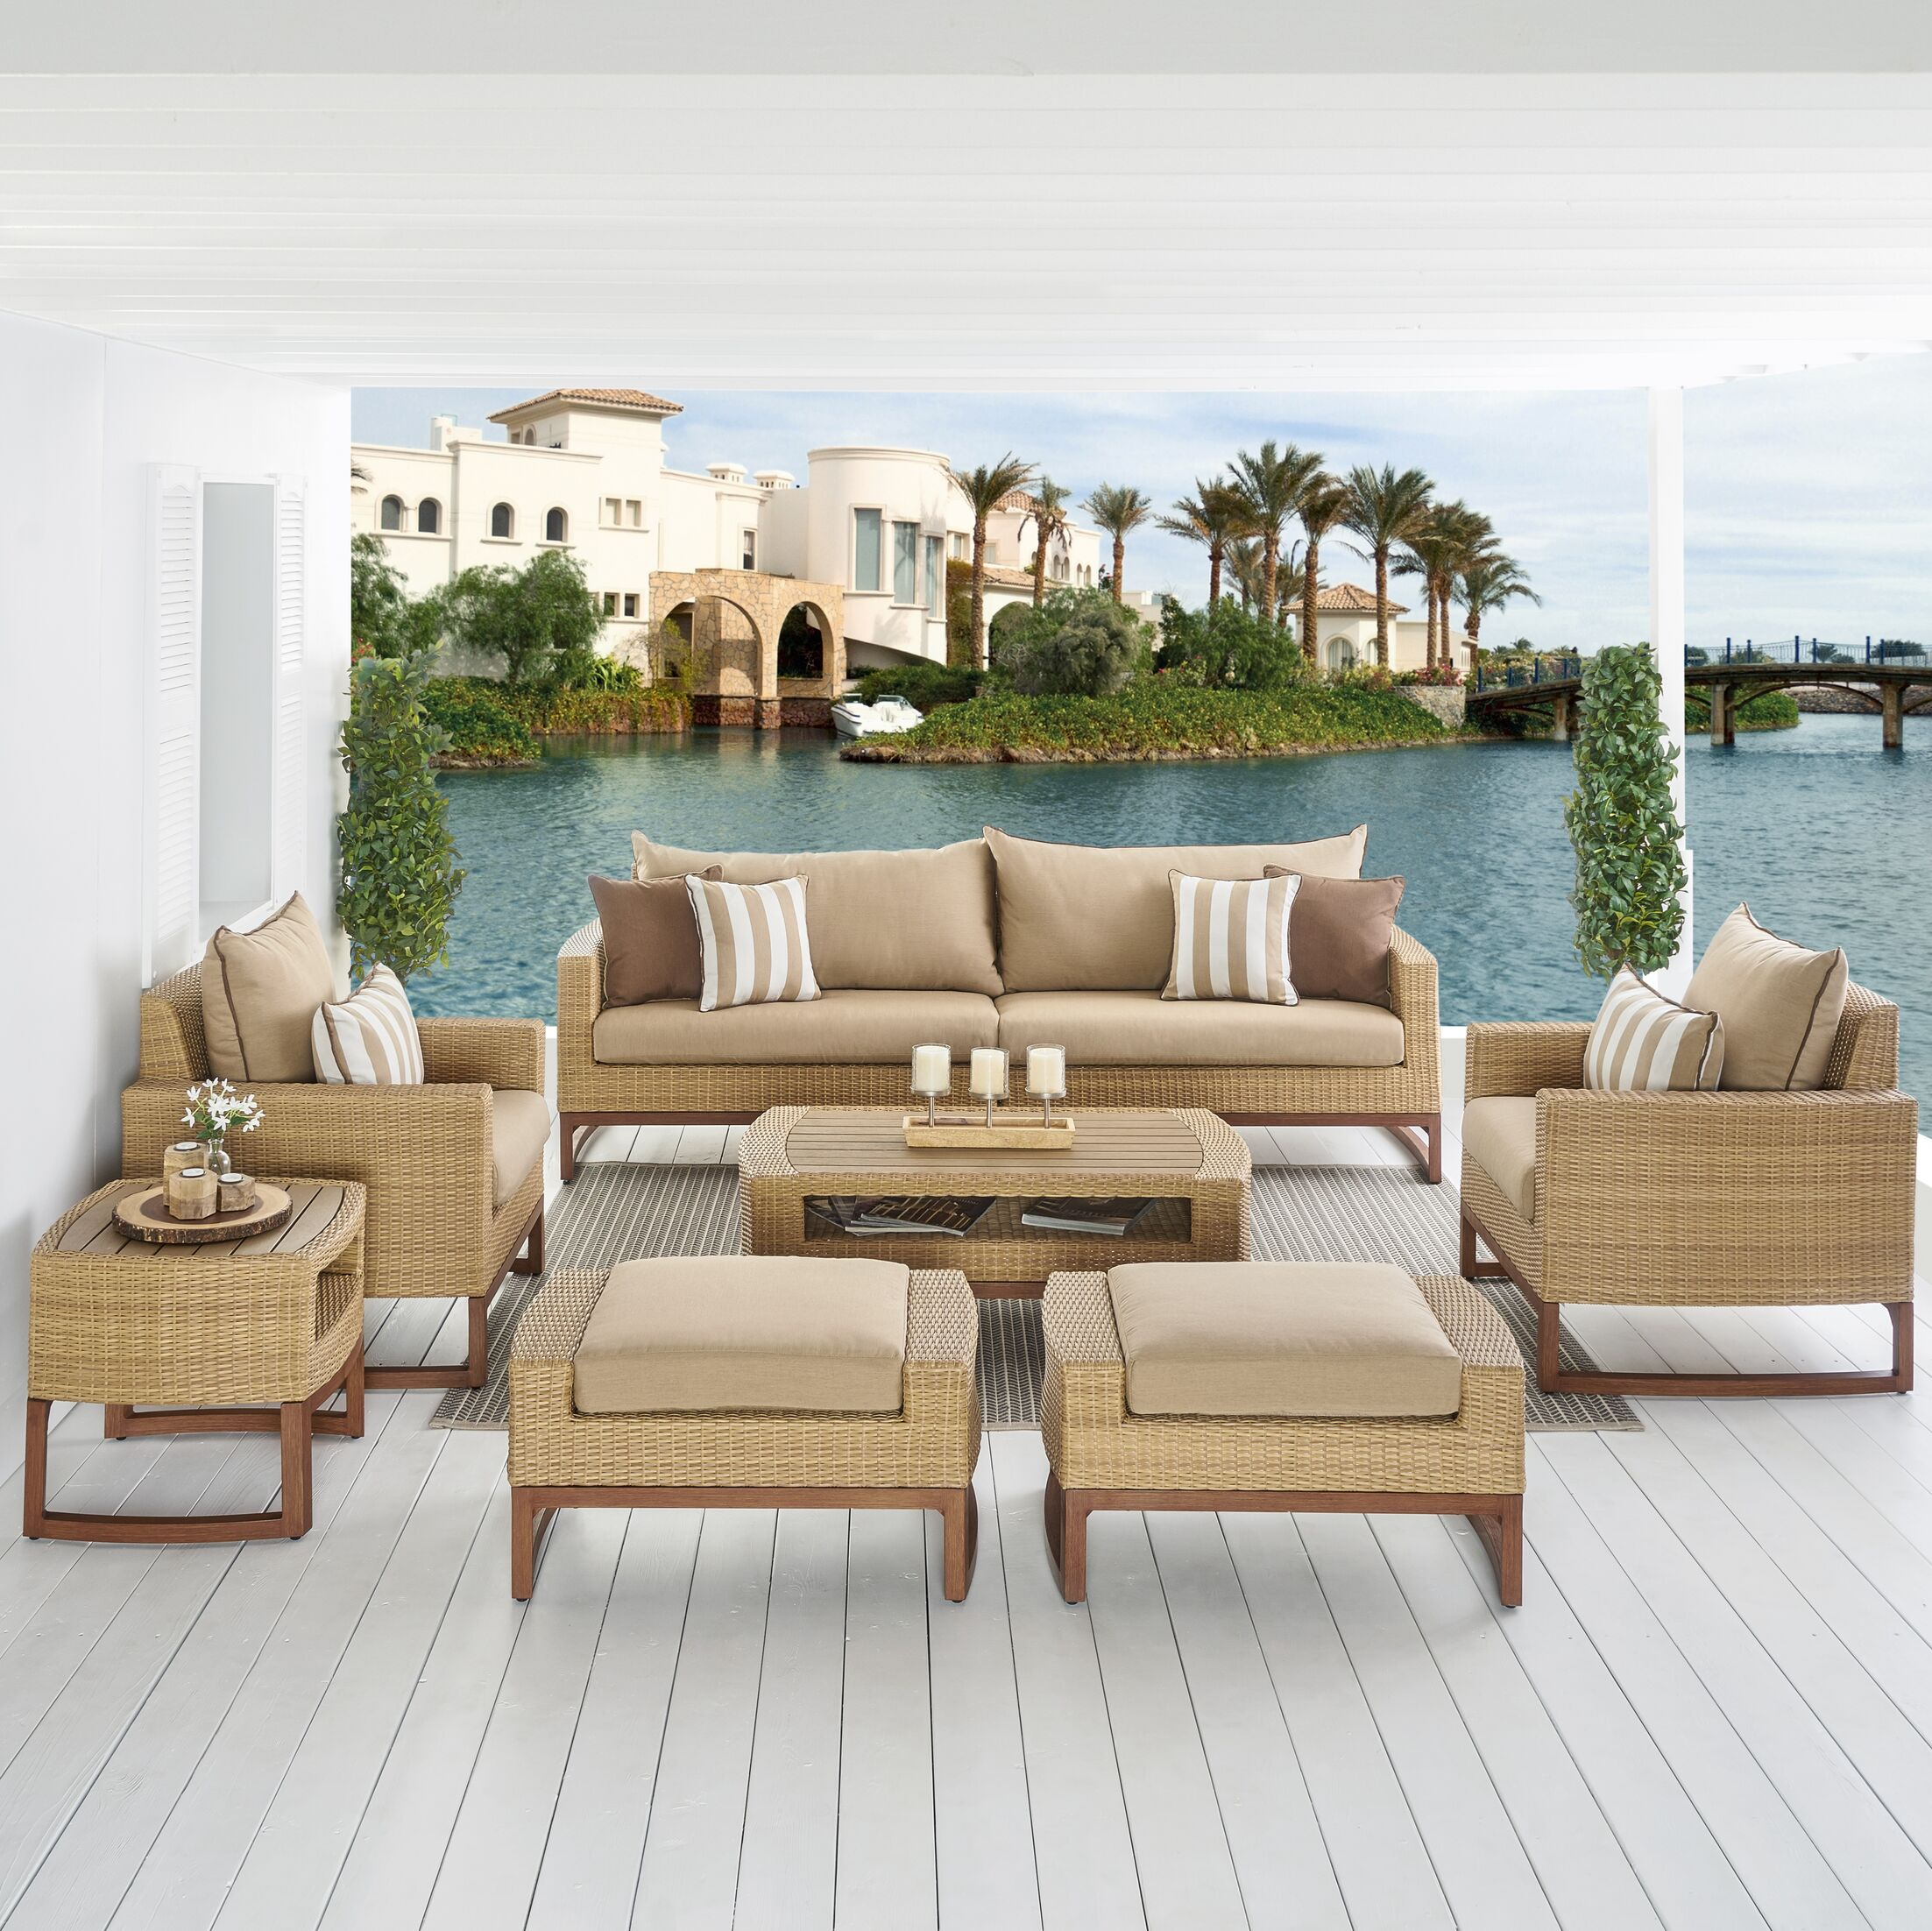 Addison 8 Piece Sunbrella Sofa Set with Cushions Fabric: Maxim Beige